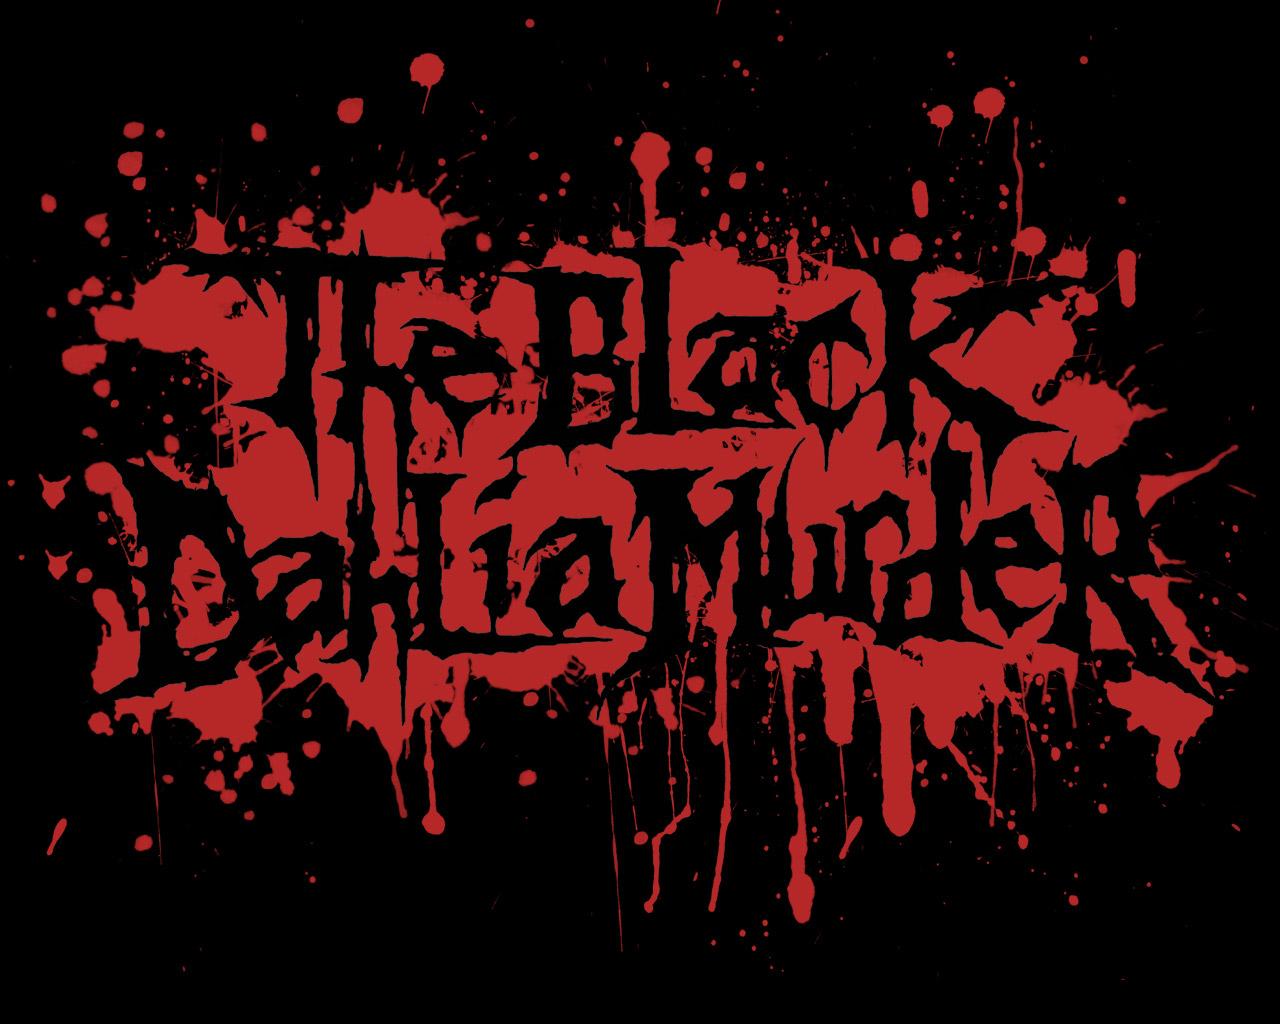 :The Black Dahlia Murder: